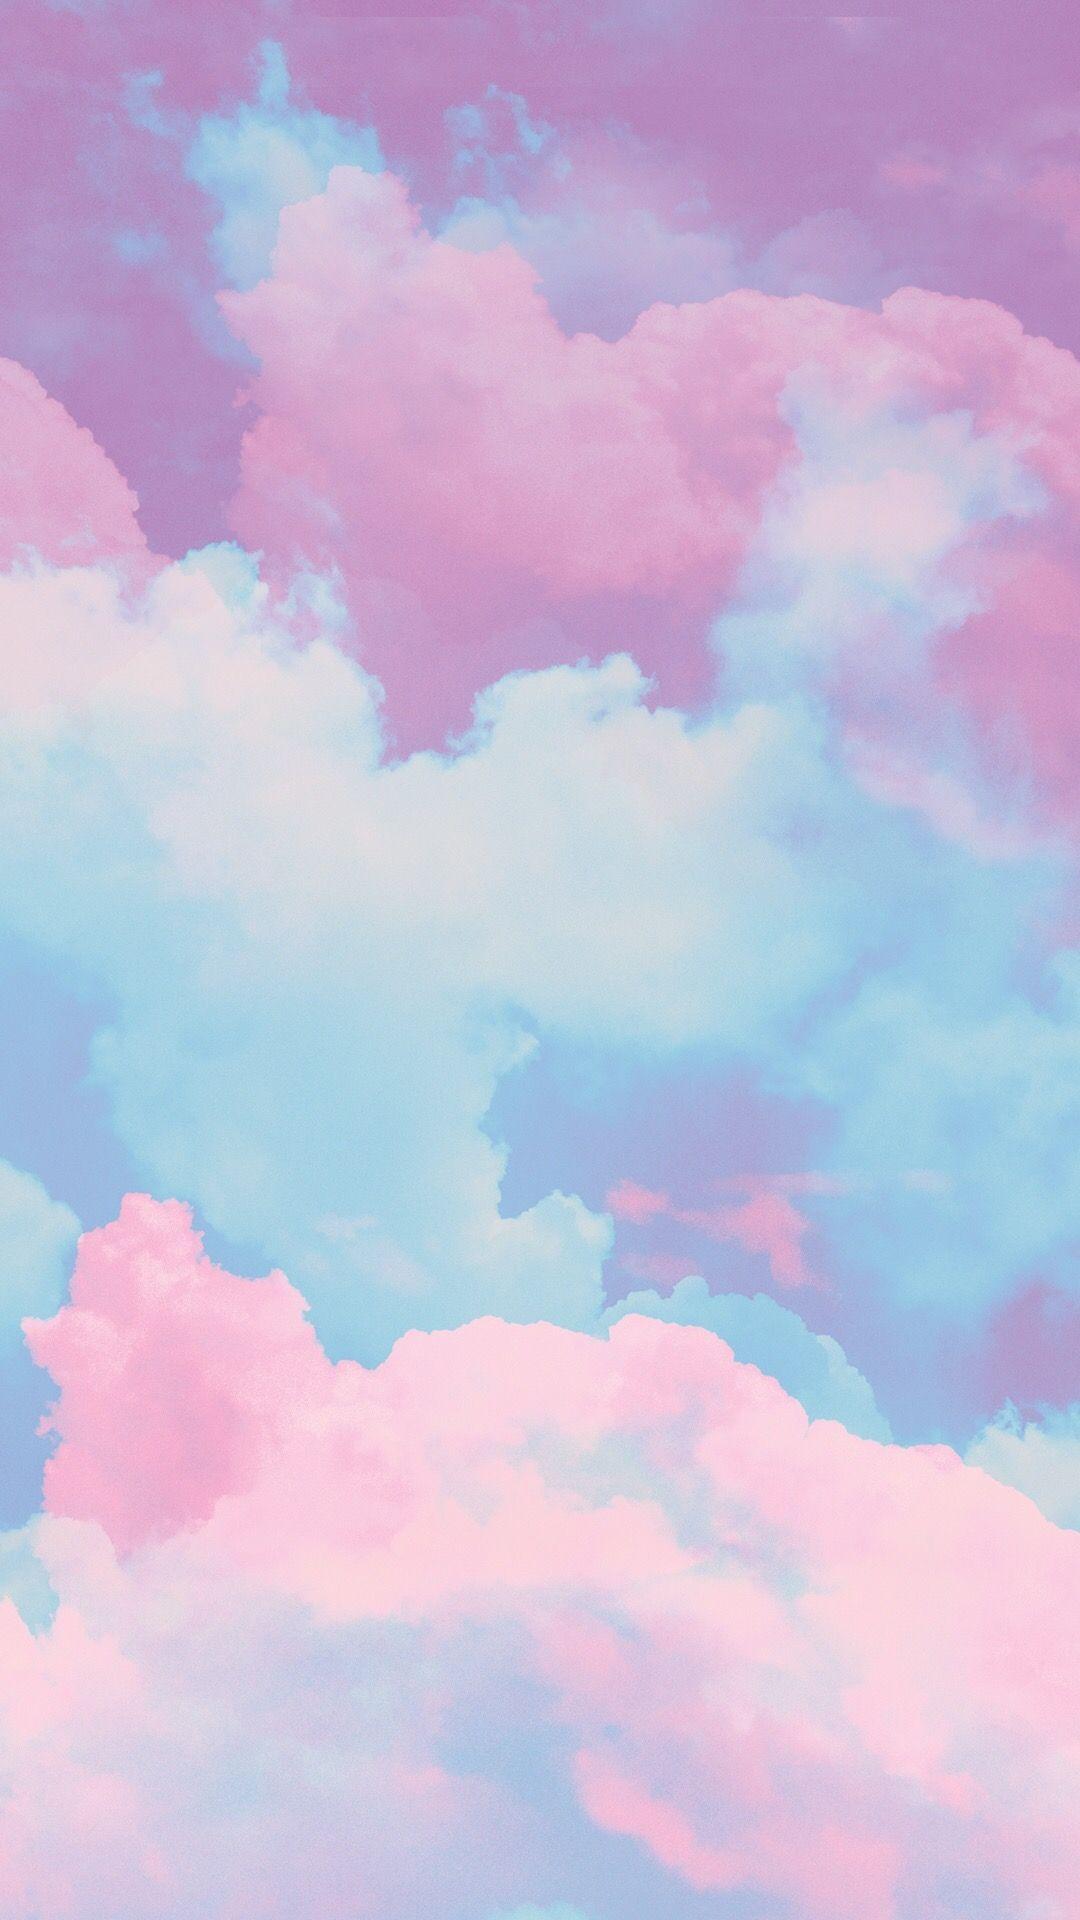 Pastel Colorful Hd Wallpaper Android Em 2020 Fundo De Aquarela Papel De Parede Para Telefone Papel De Parede Wpp